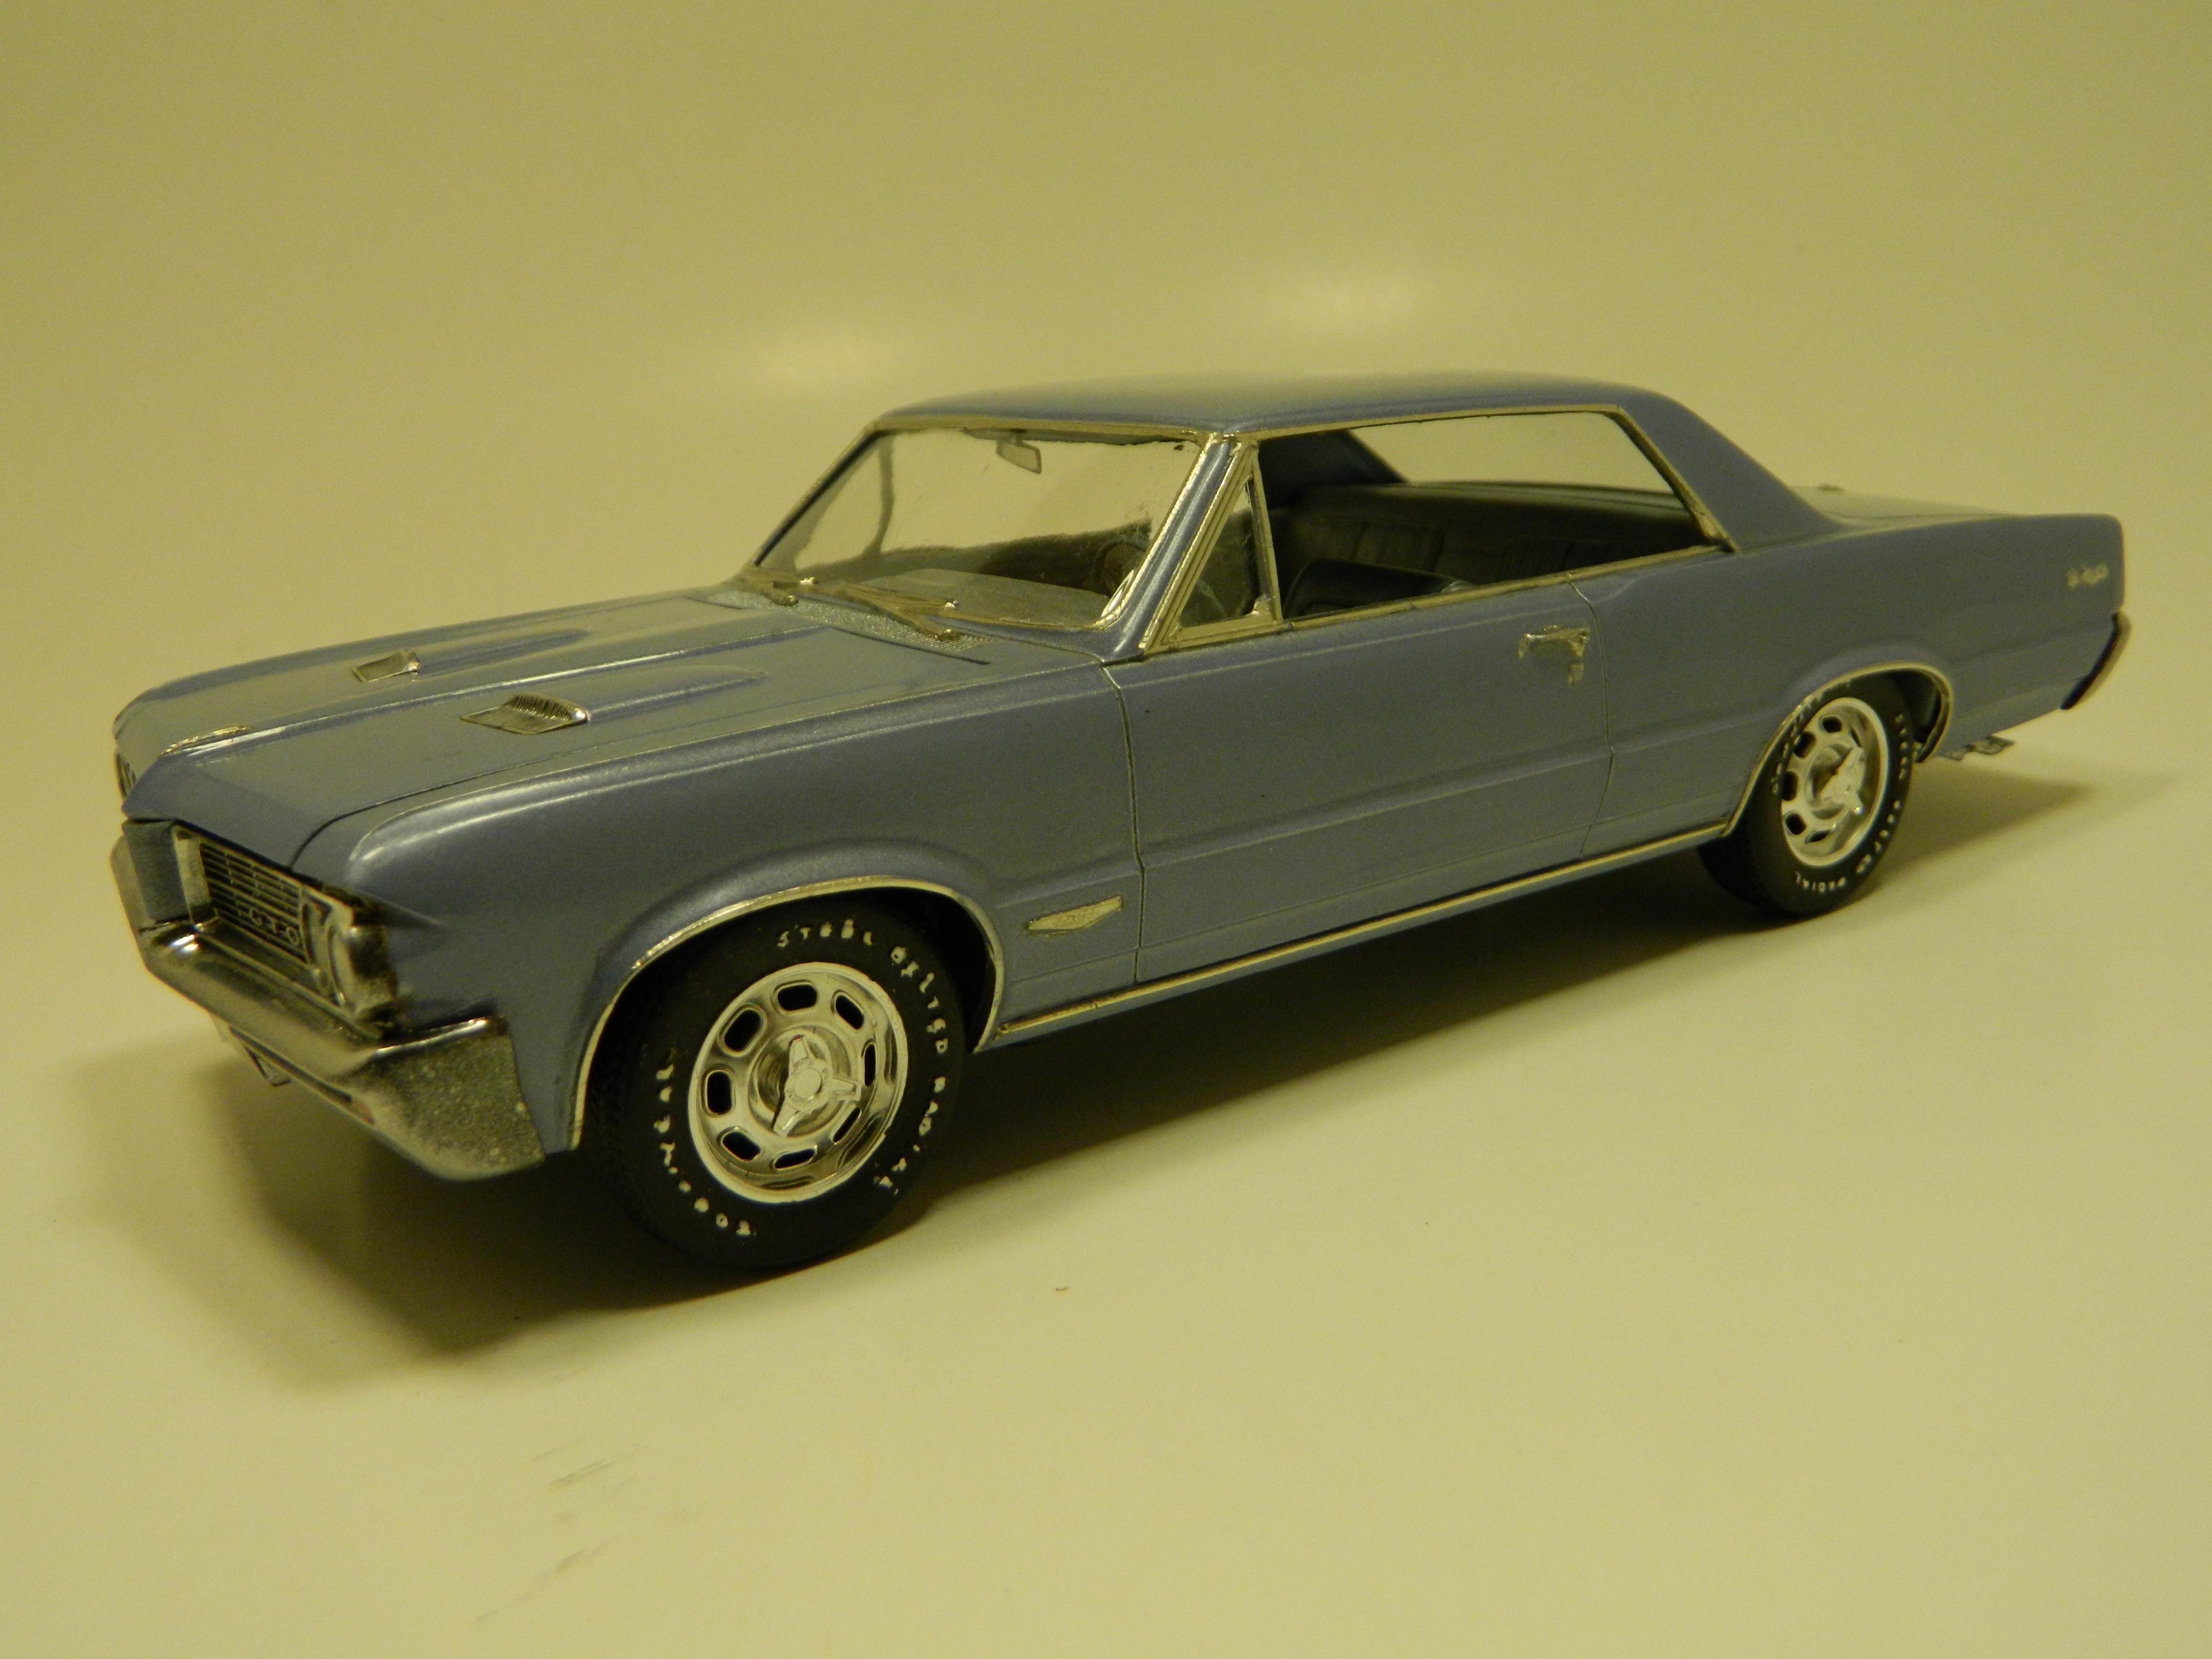 1964 Pontiac GTO - Under Glass - Model Cars Magazine Forum